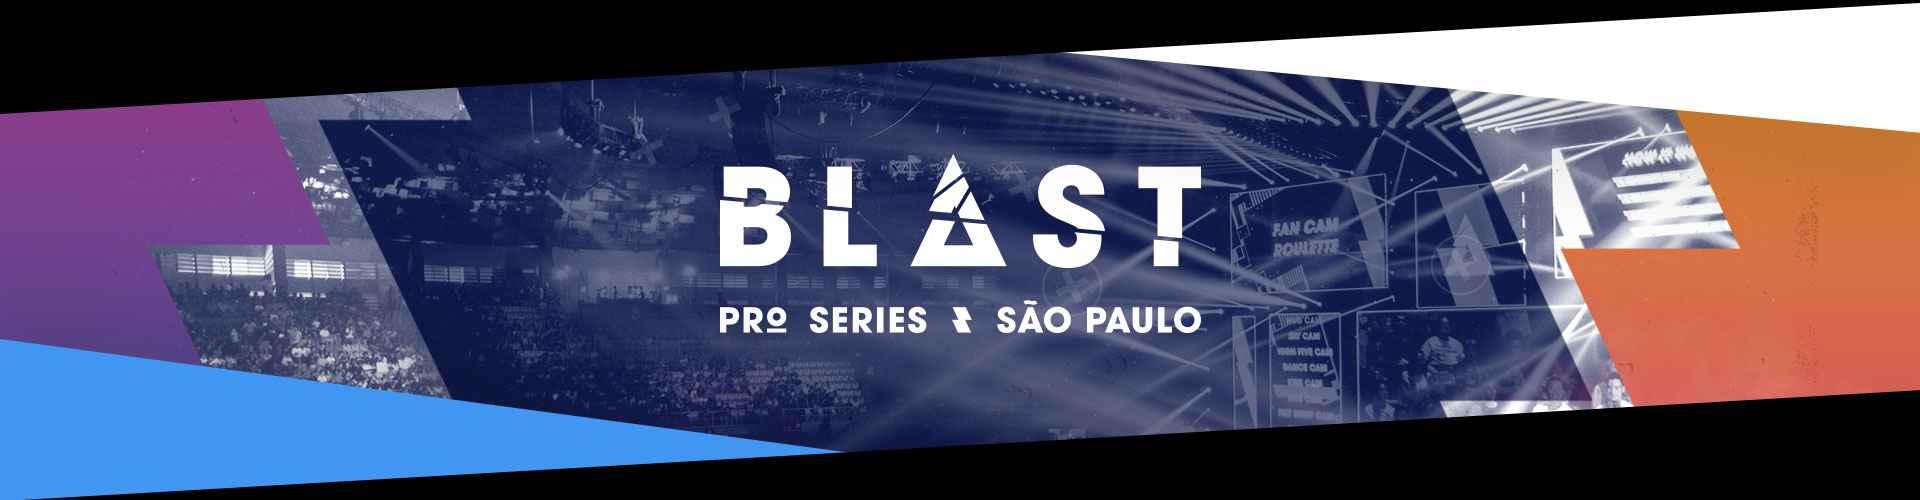 CS:GO BLAST Pro Series Sao Paulo eventguide